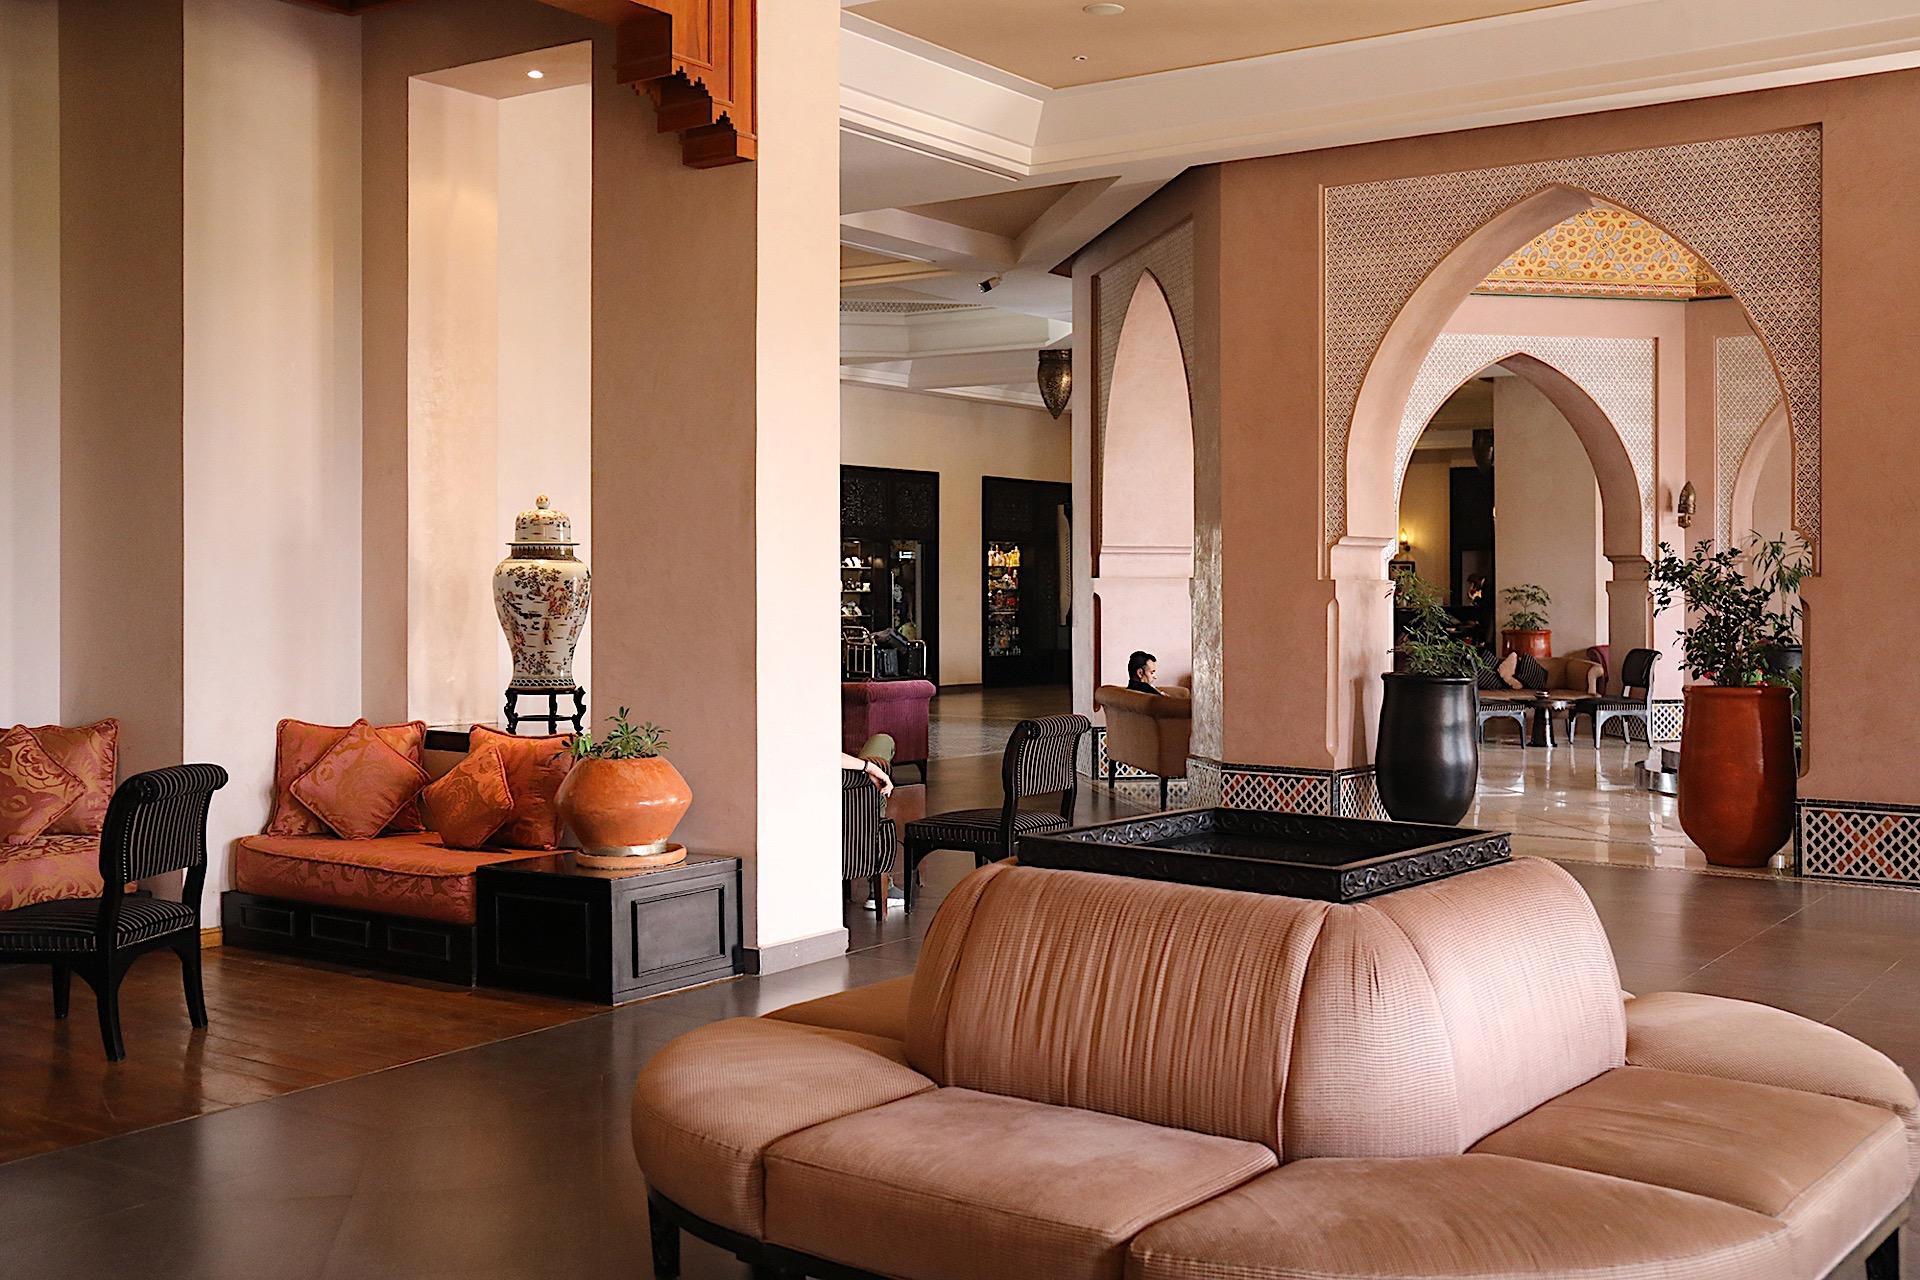 Lobby at Kenzi Menara Palace in Marrakesh, Morocco